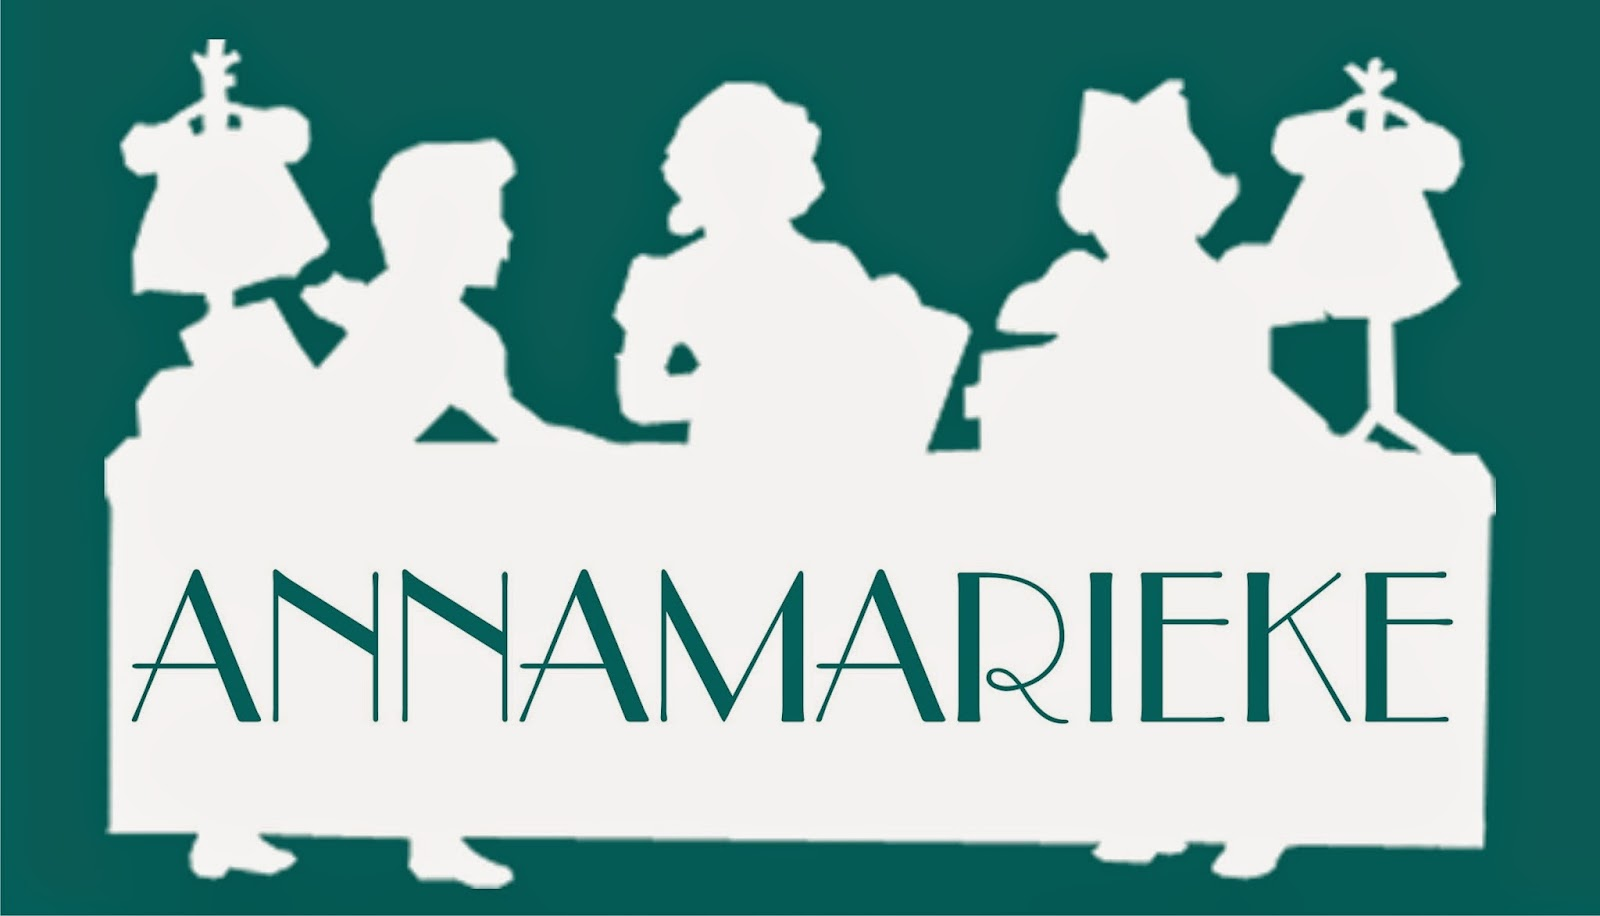 http://www.annamarieke.be/